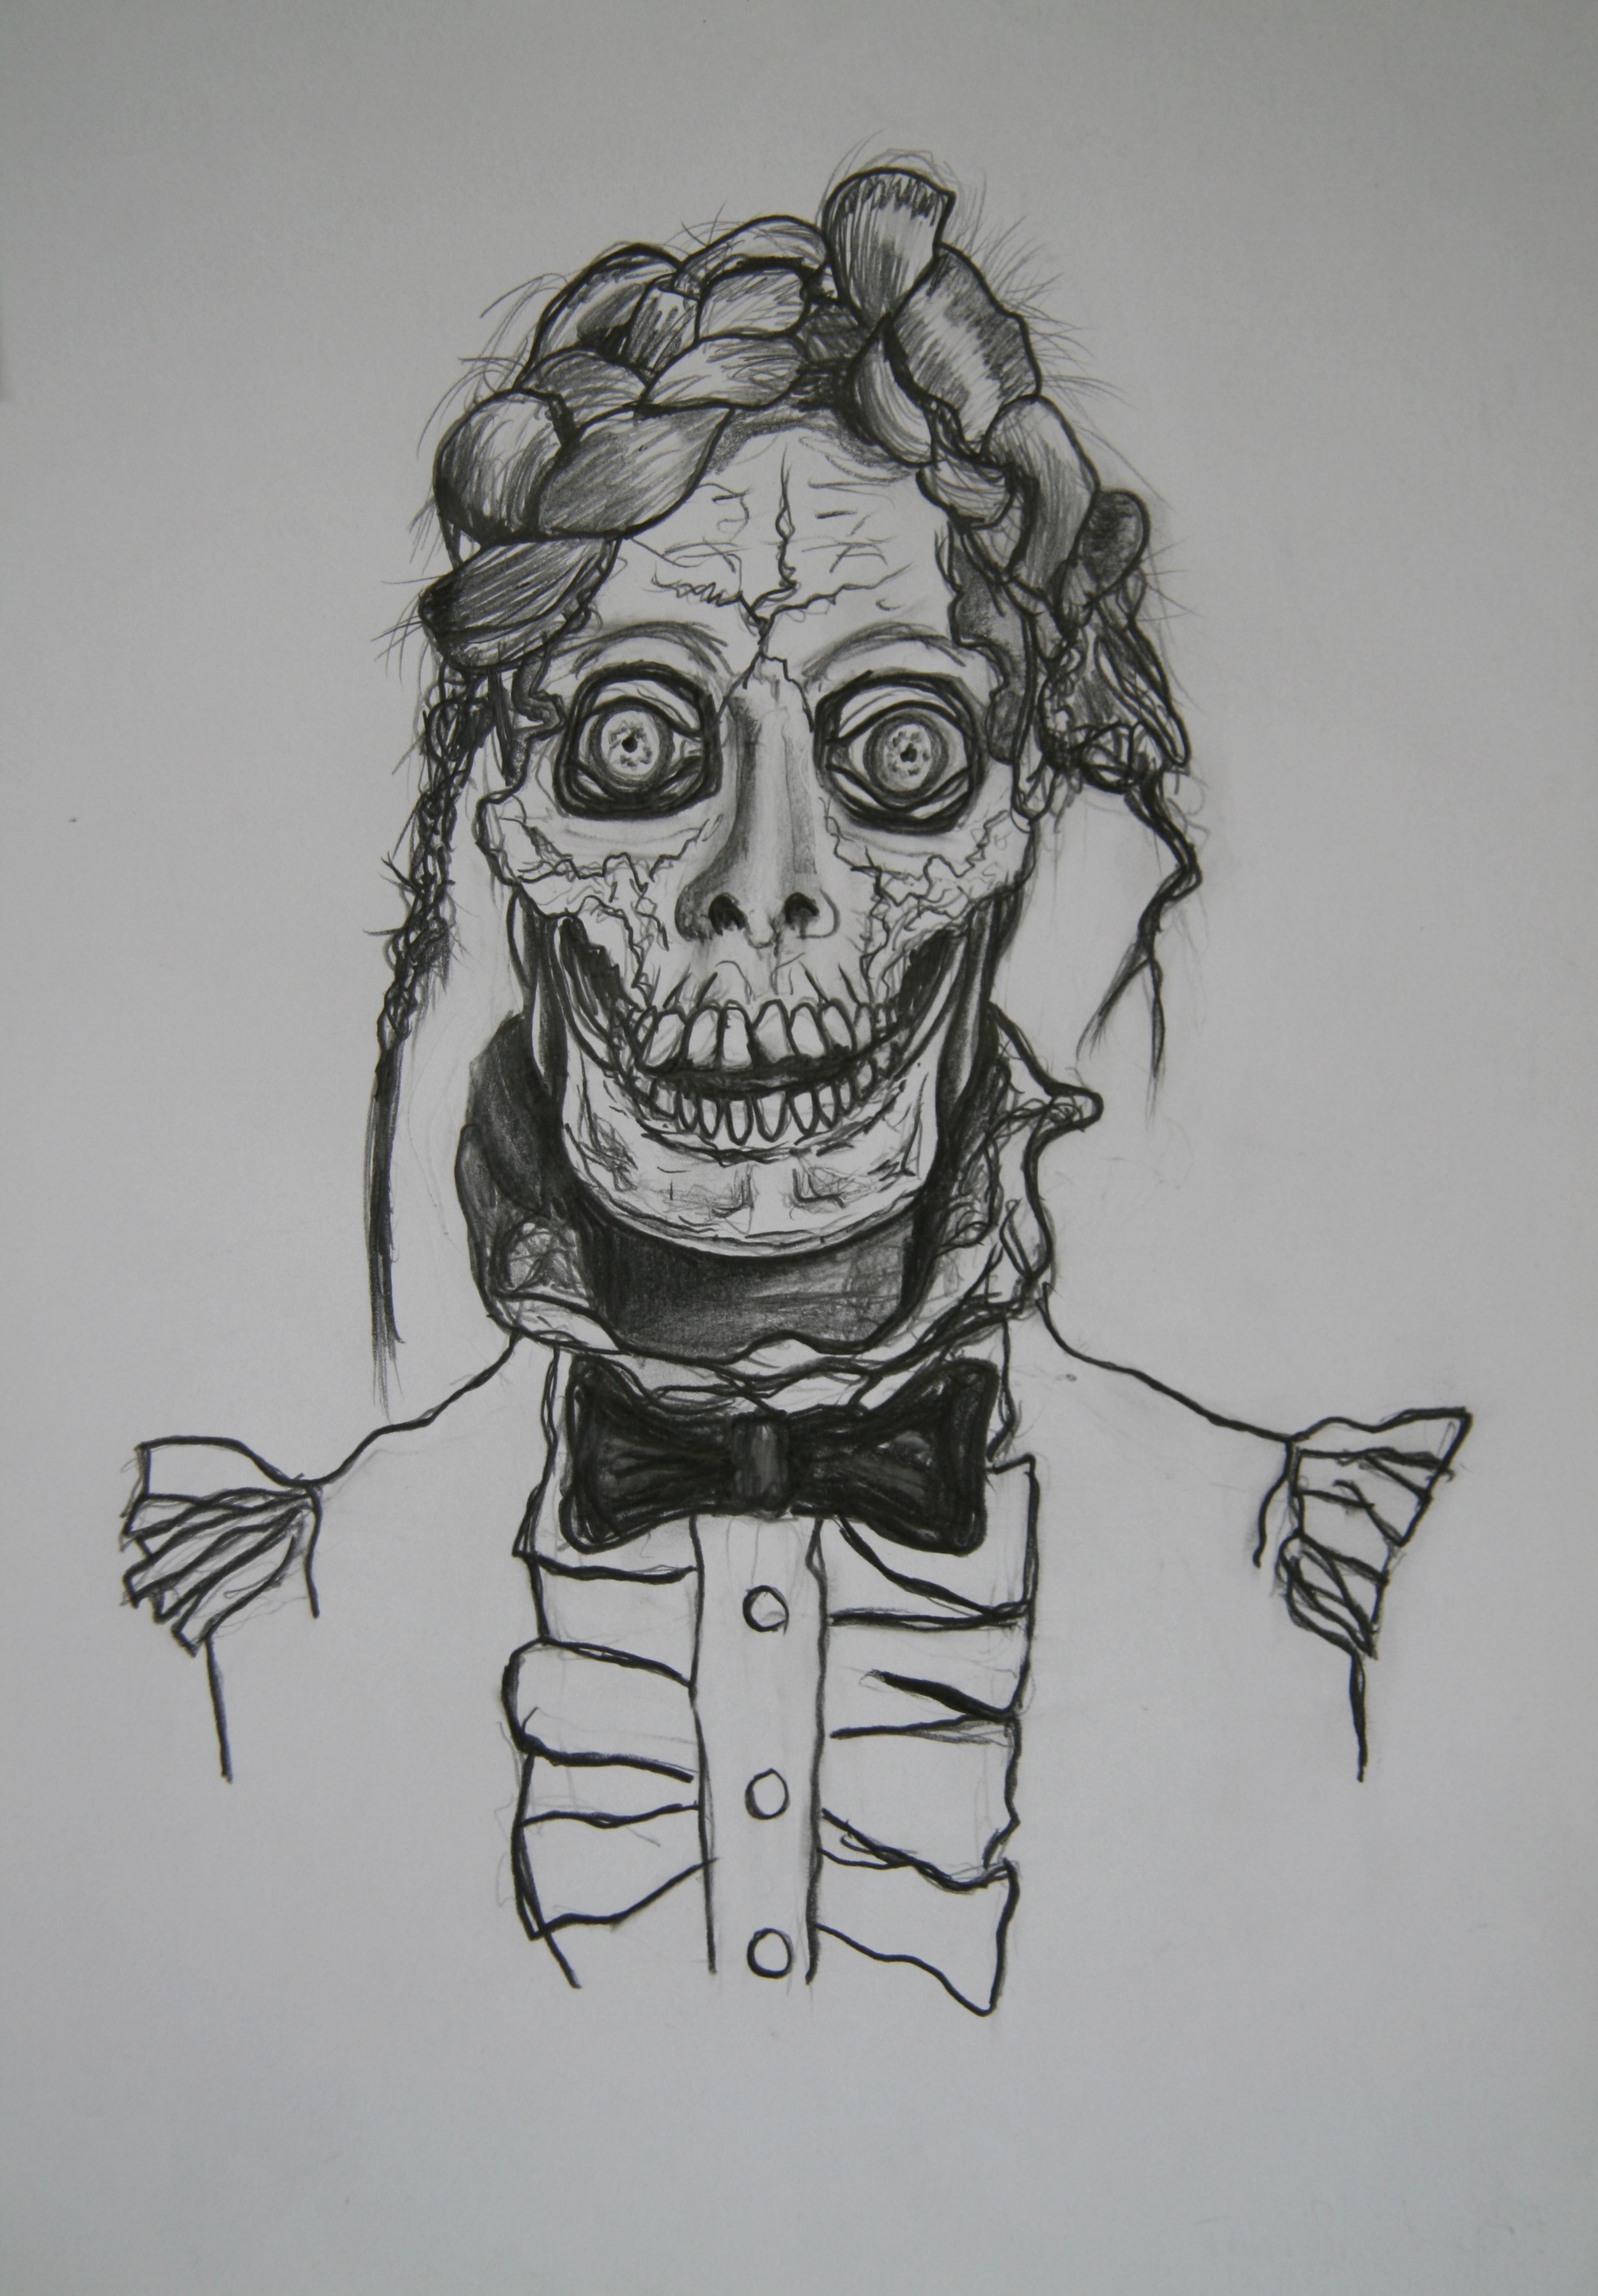 Skull 14, 30x21cm, pencil on paper